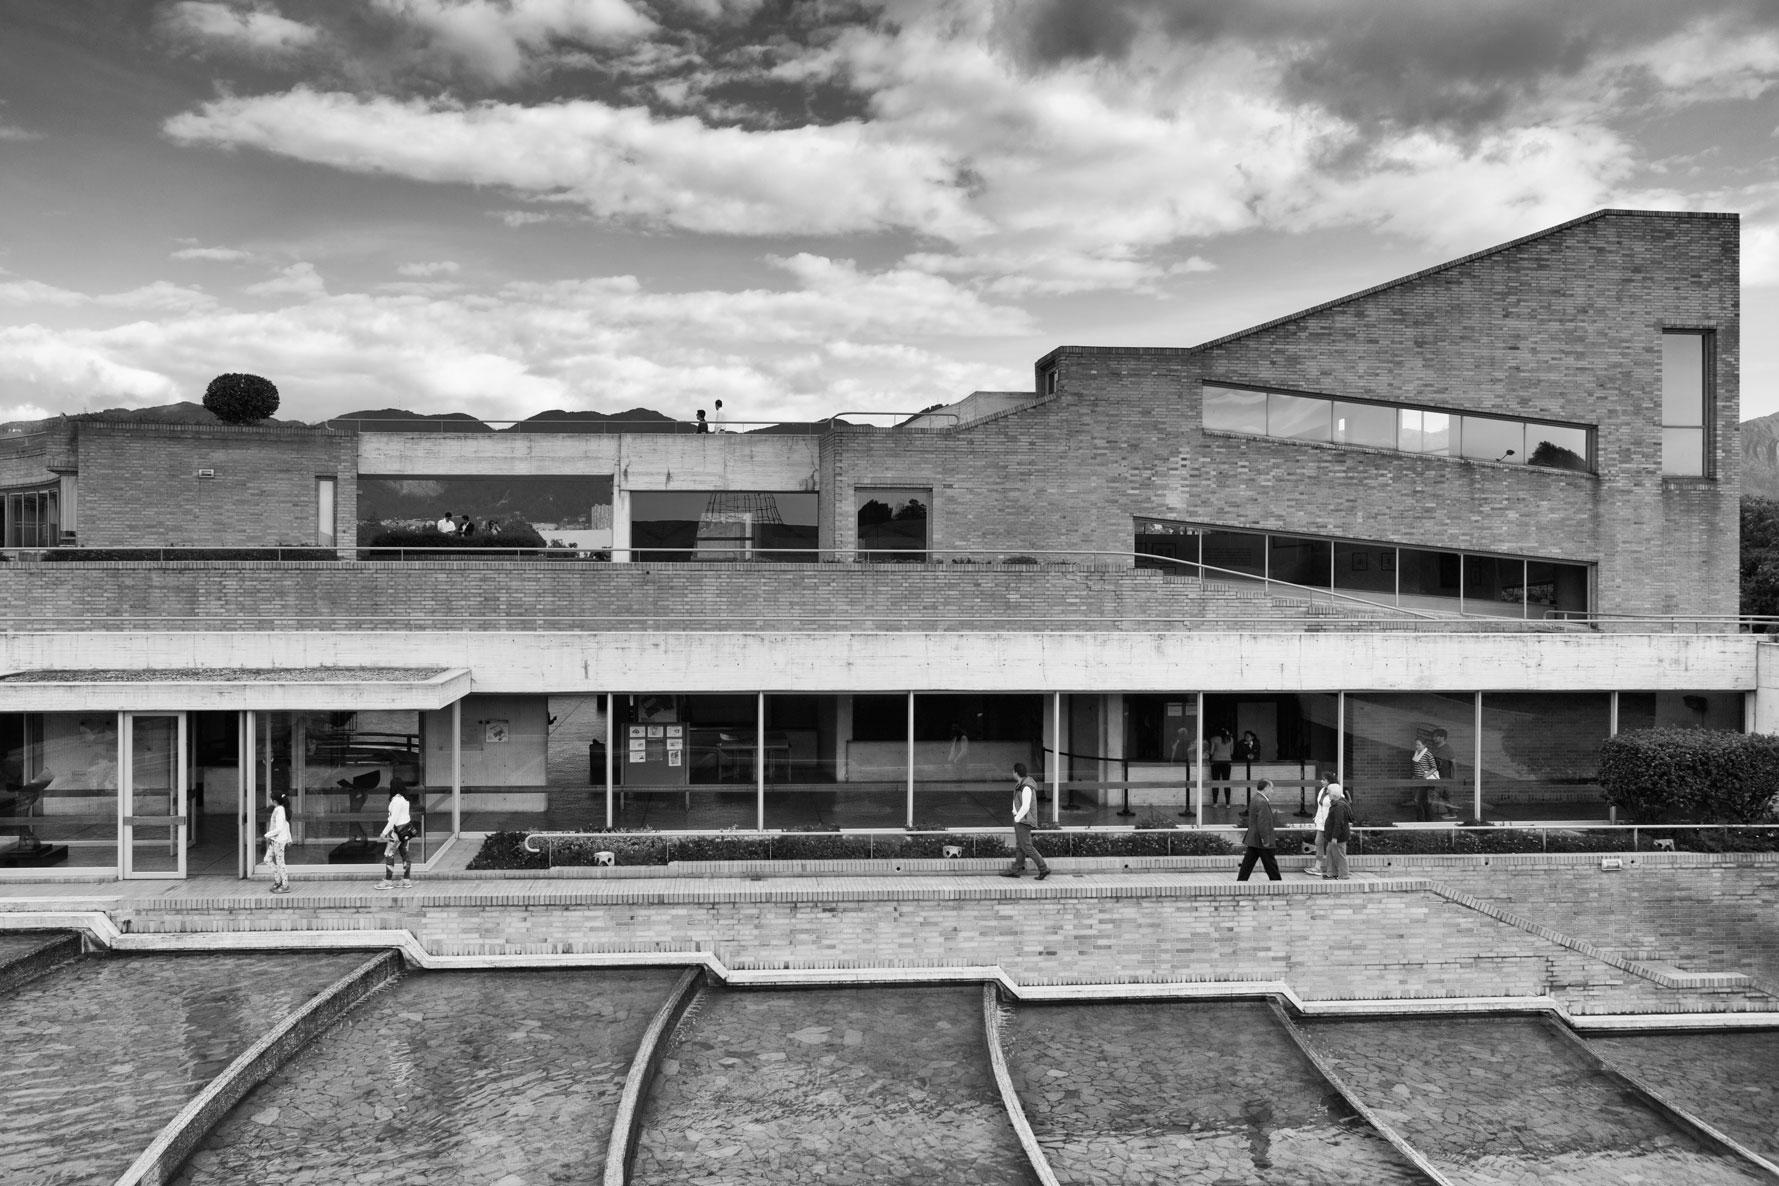 05-simonbosch photography-simon-bosch-architectuur-architecture-bogota-colombia-ArchDaily-Biblioteca Publica Virgilio Barco